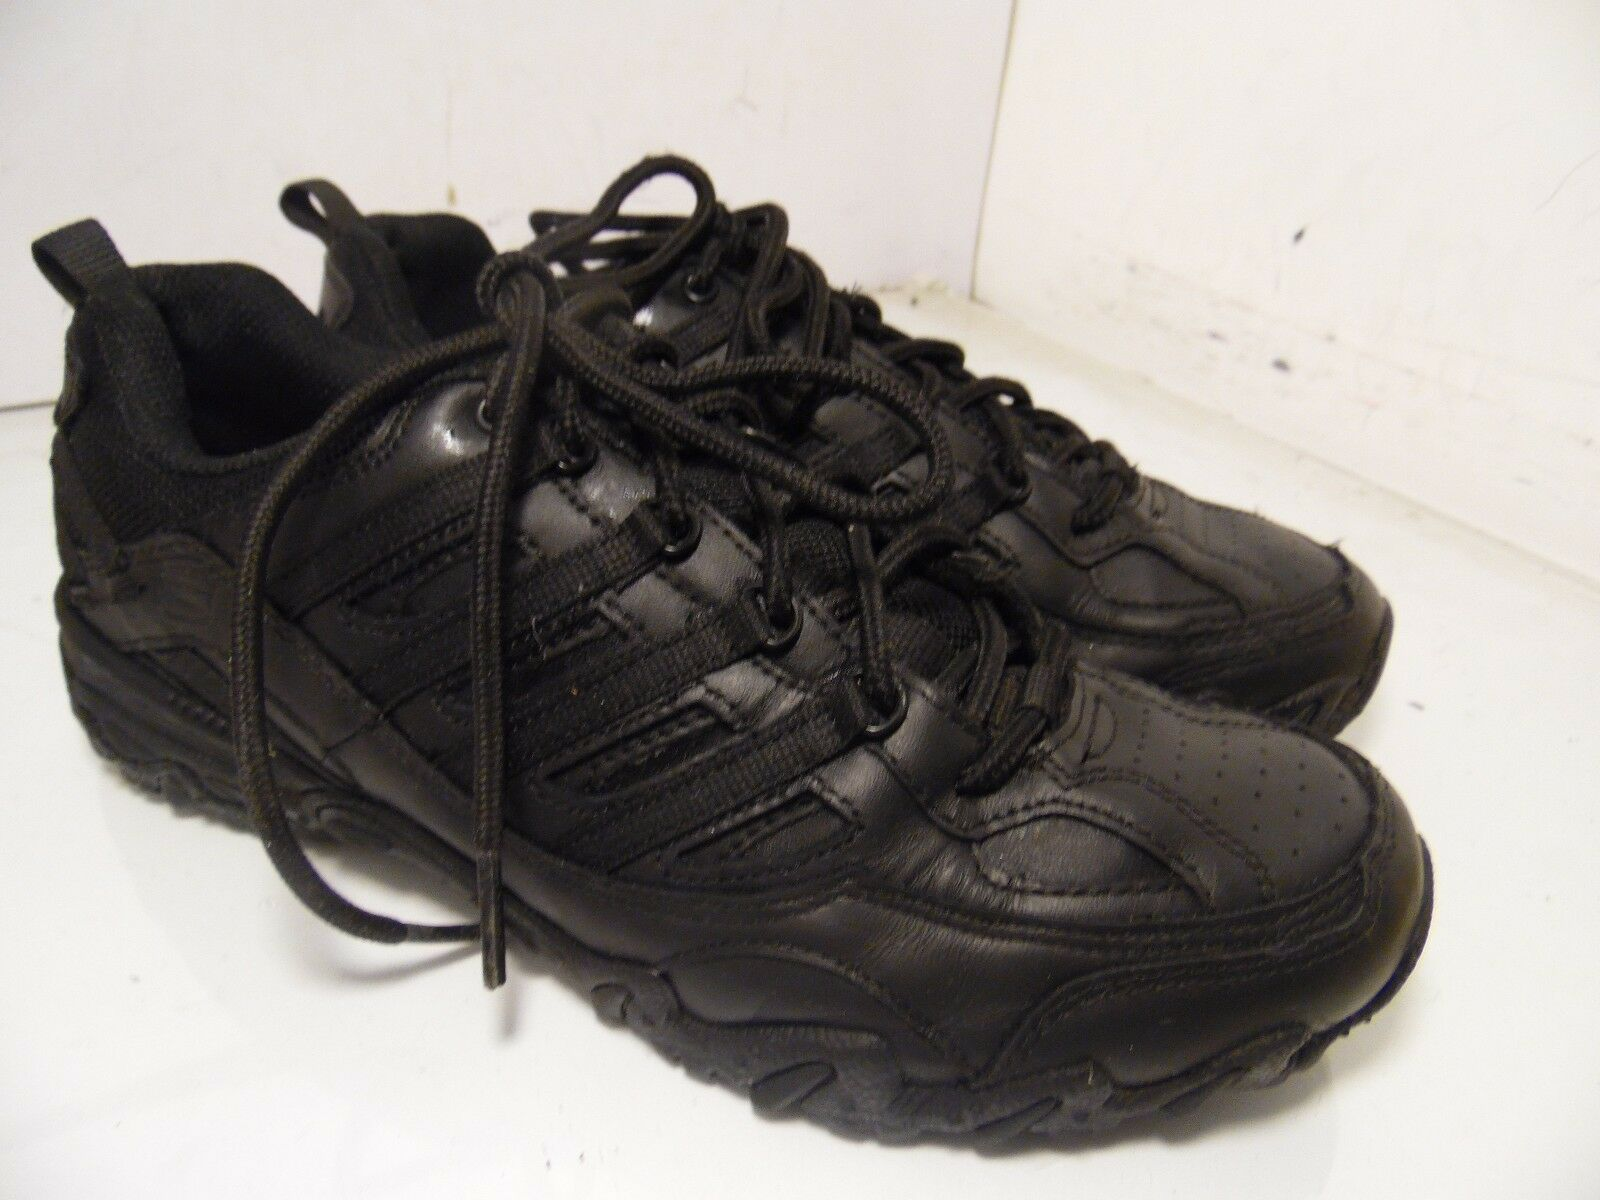 al comfortable black hi men shoe payless on res resistant safetstep mens comforter slip s shoes